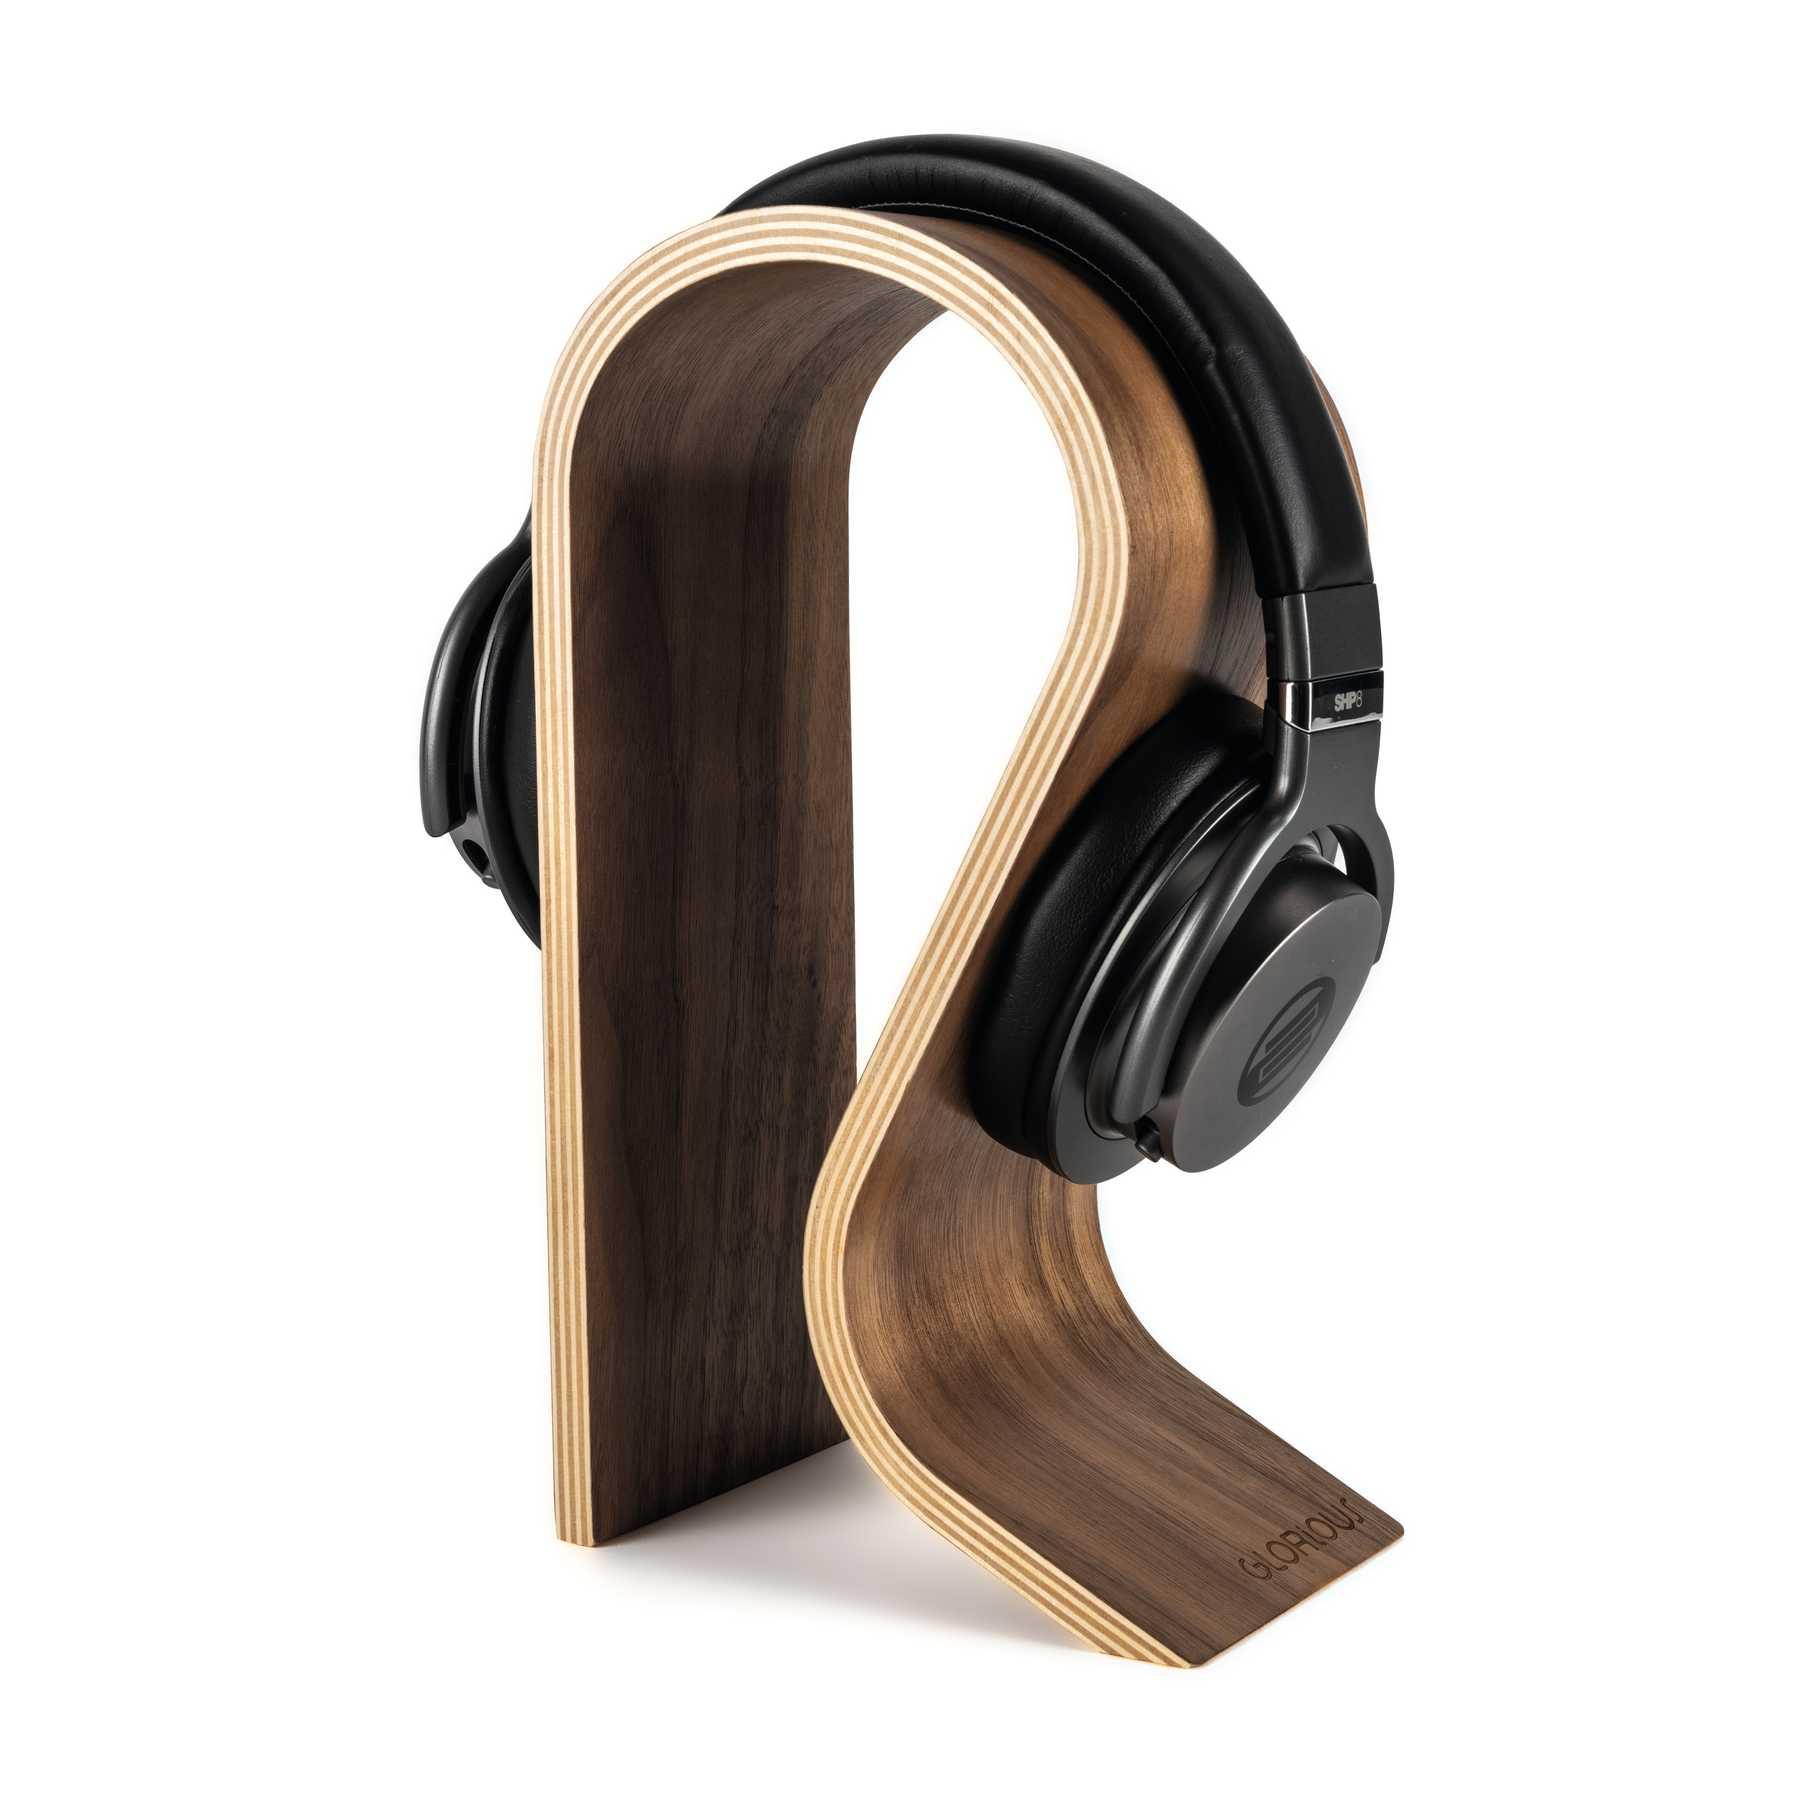 Glorious Headphones Stand 240750